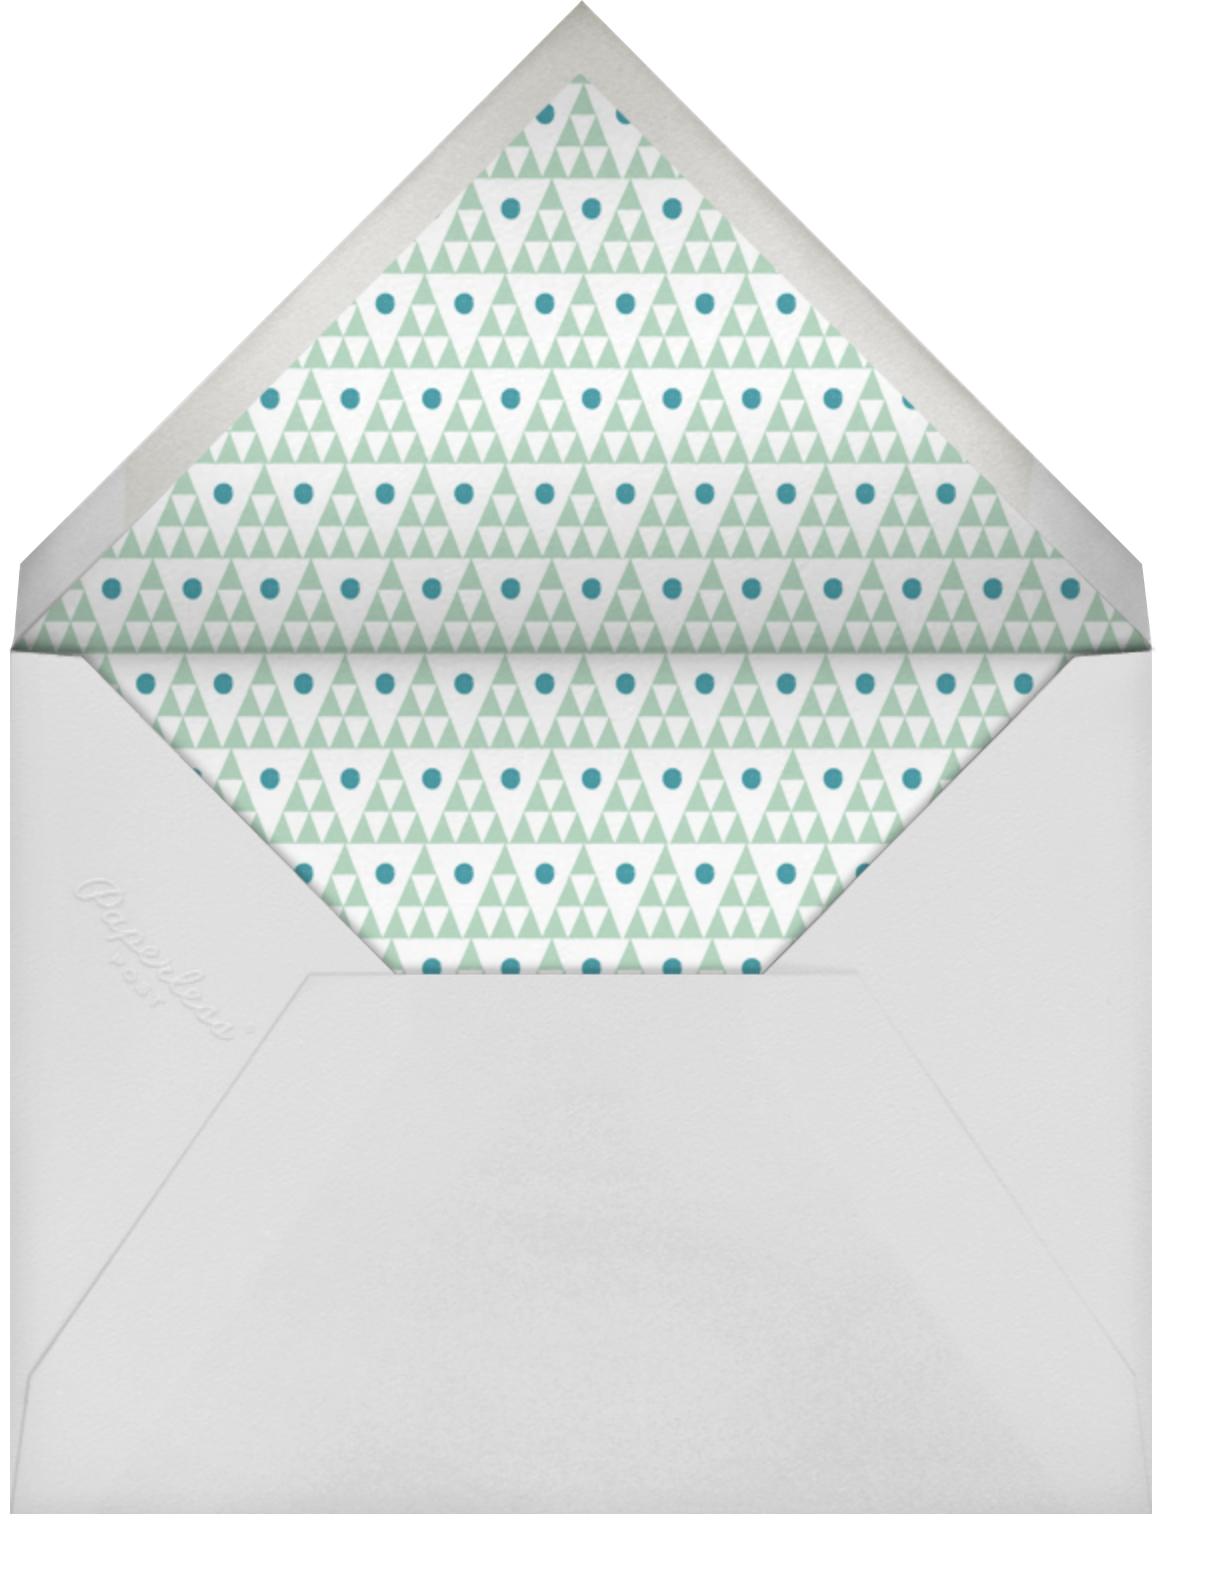 Five Seconds - Tan - Mr. Boddington's Studio - Anniversary cards - envelope back